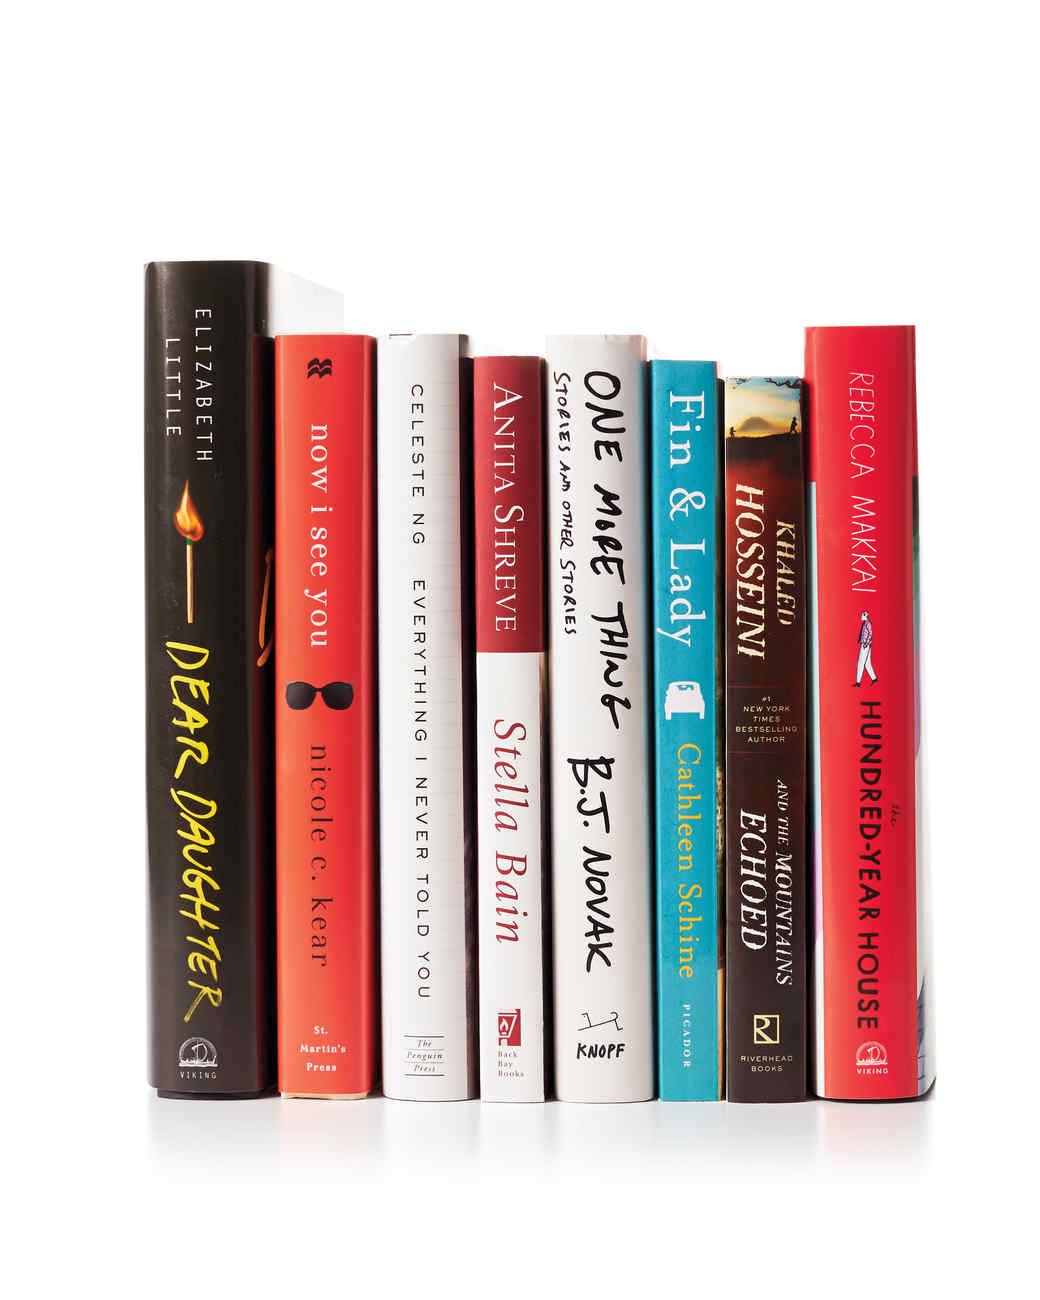 books-041-d111241.jpg